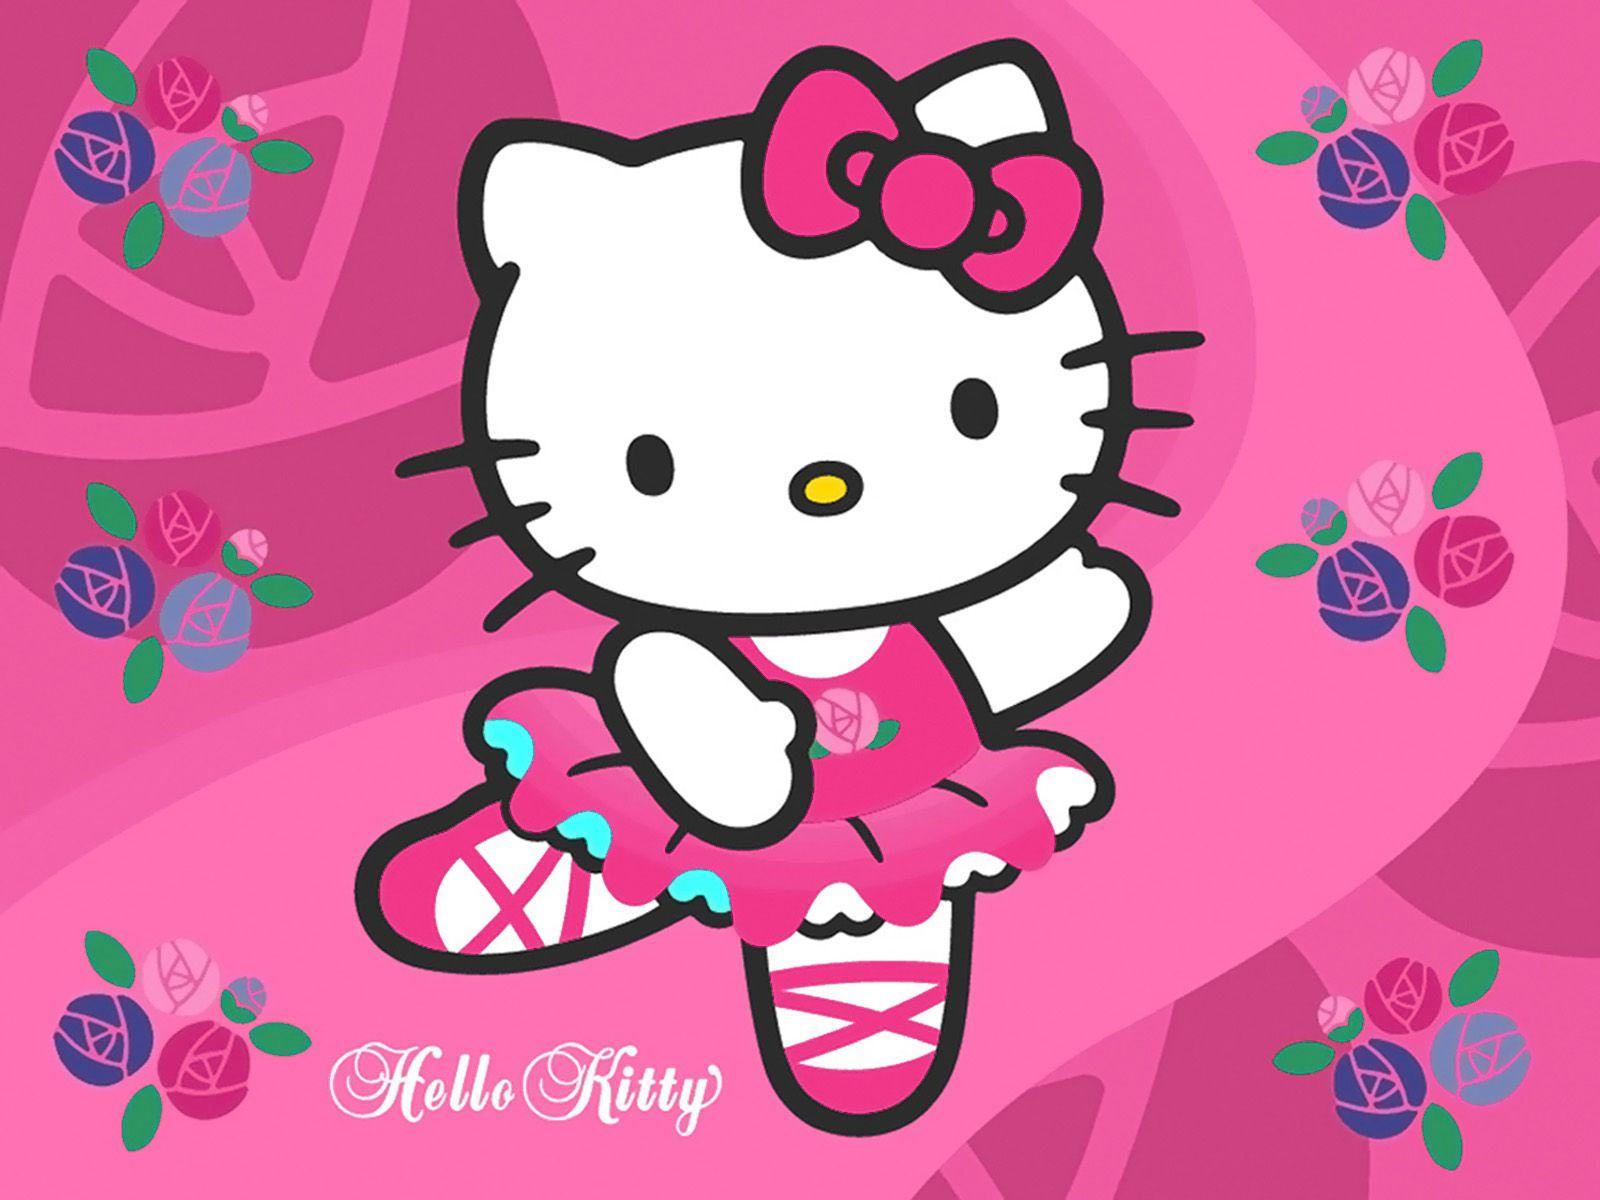 Most Inspiring Wallpaper Hello Kitty Angel - 5e17dd8acb3ad03a52615a13f78d0181  Pic_449824.jpg